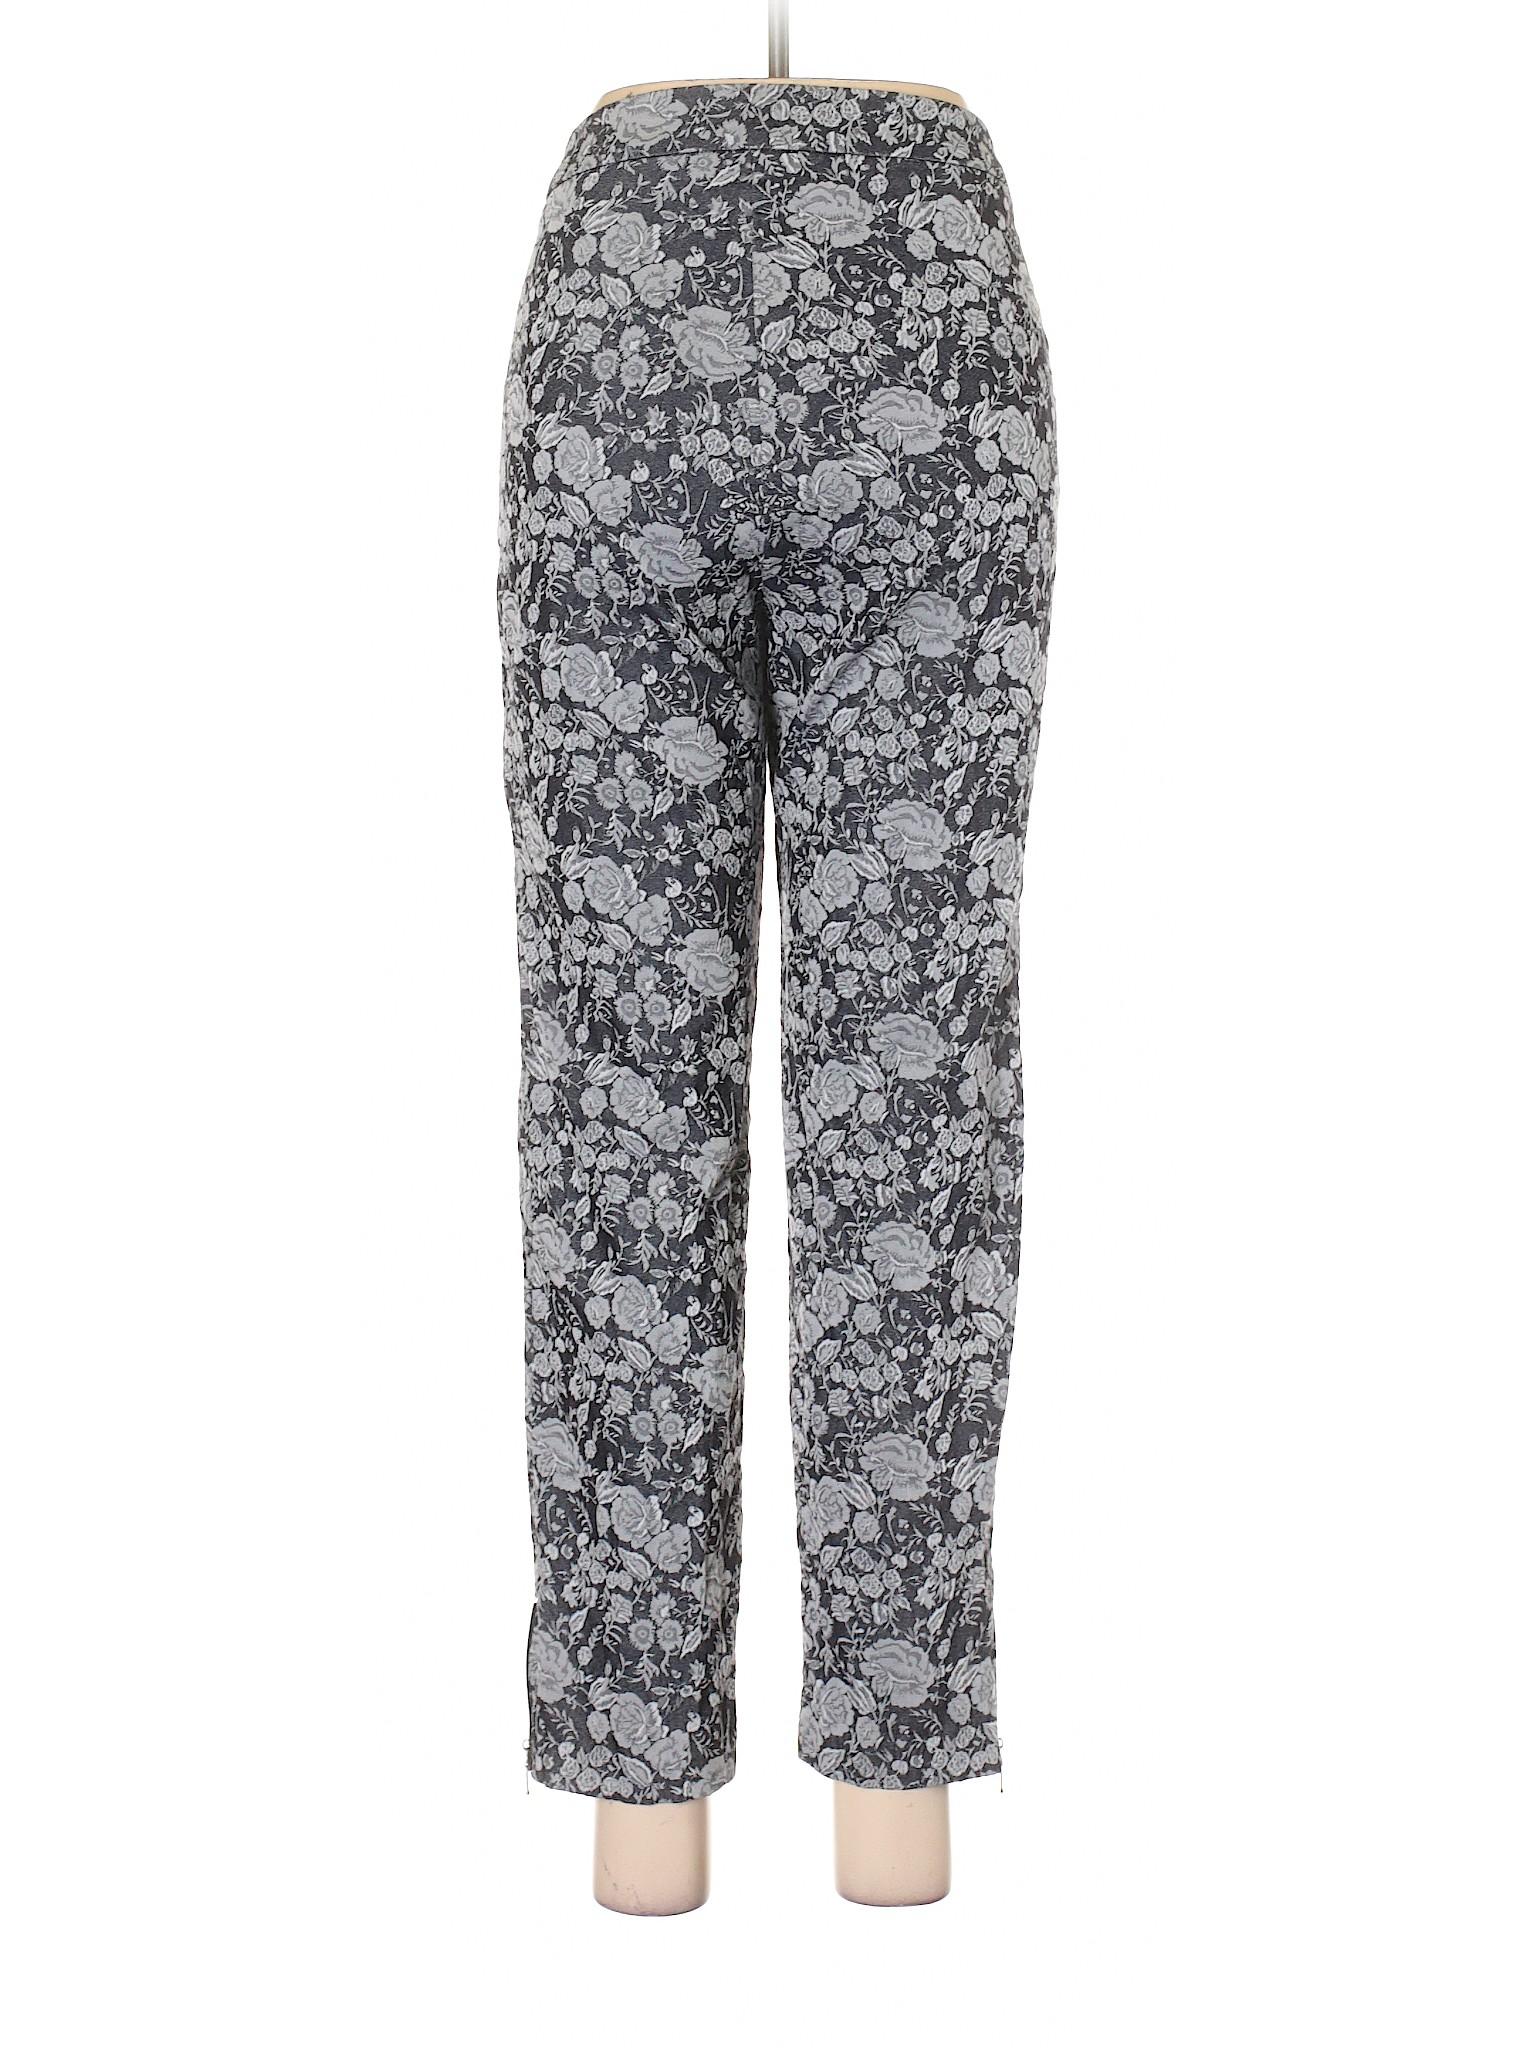 Dress Boutique SOHO Pants leisure Ltd Apparel OYIZUgIq